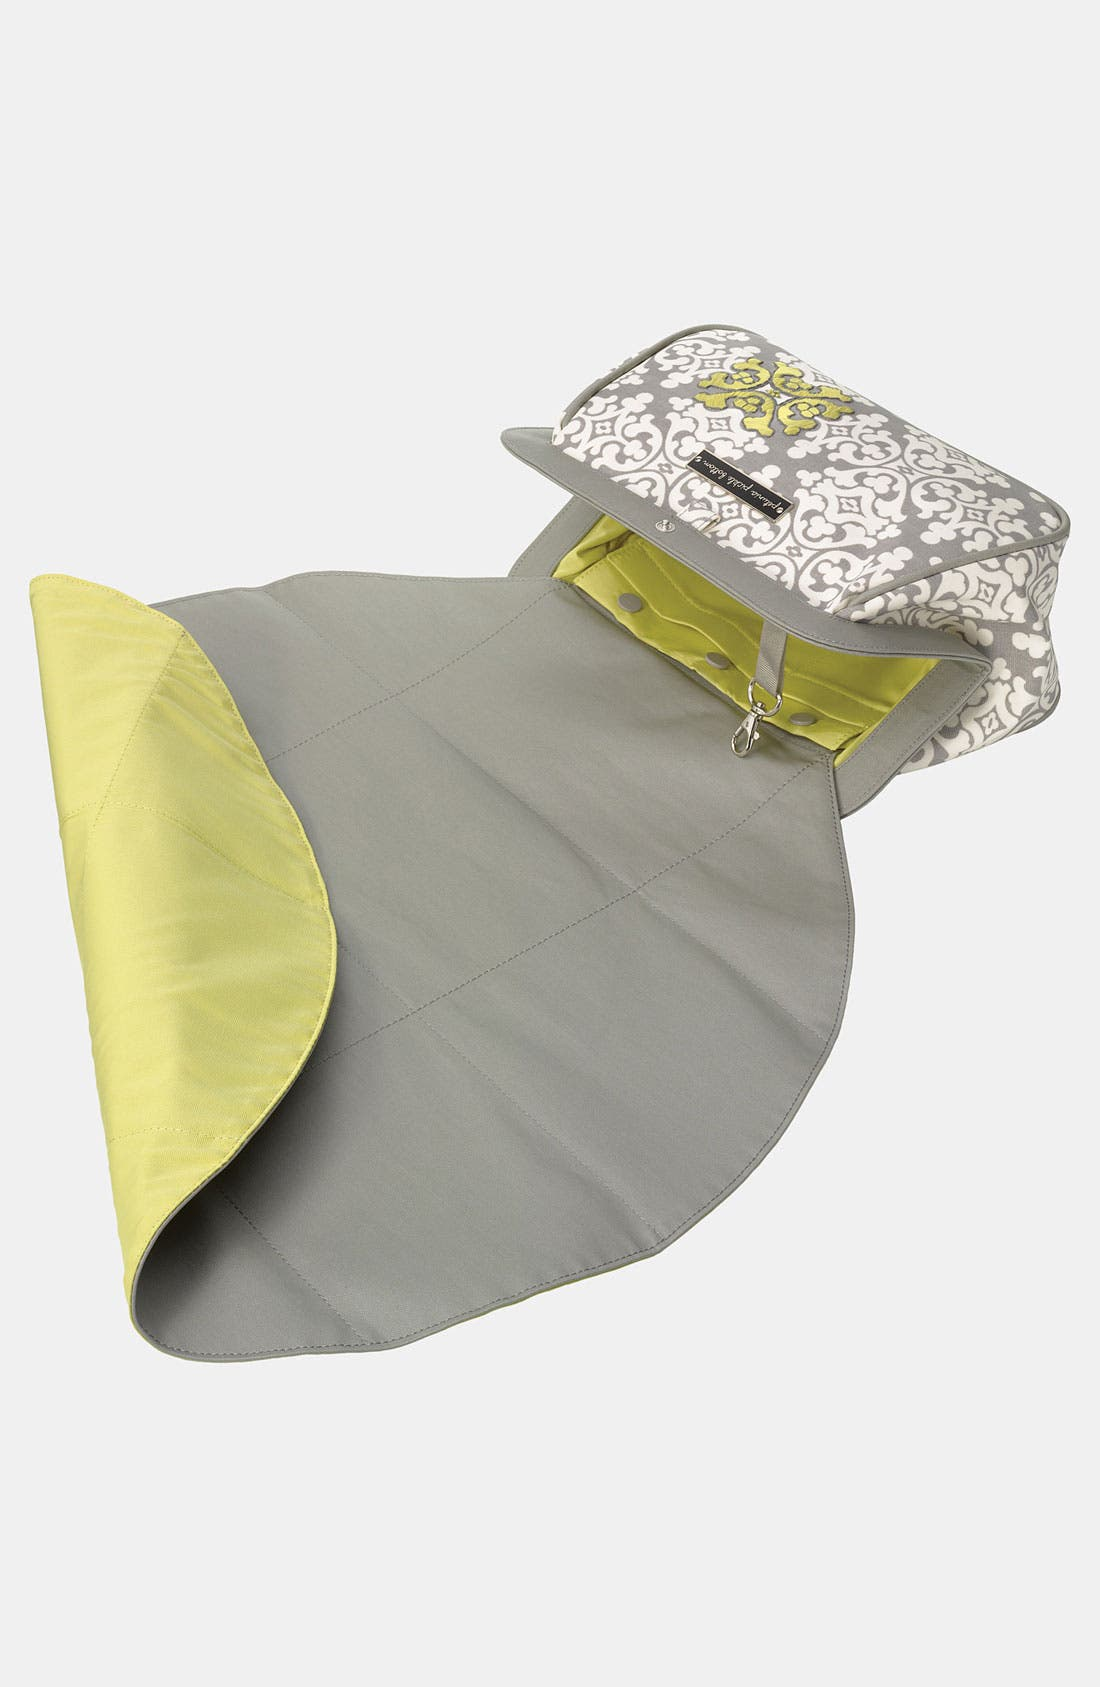 Alternate Image 2  - Petunia Pickle Bottom 'Crosstown' Glazed Clutch Diaper Bag